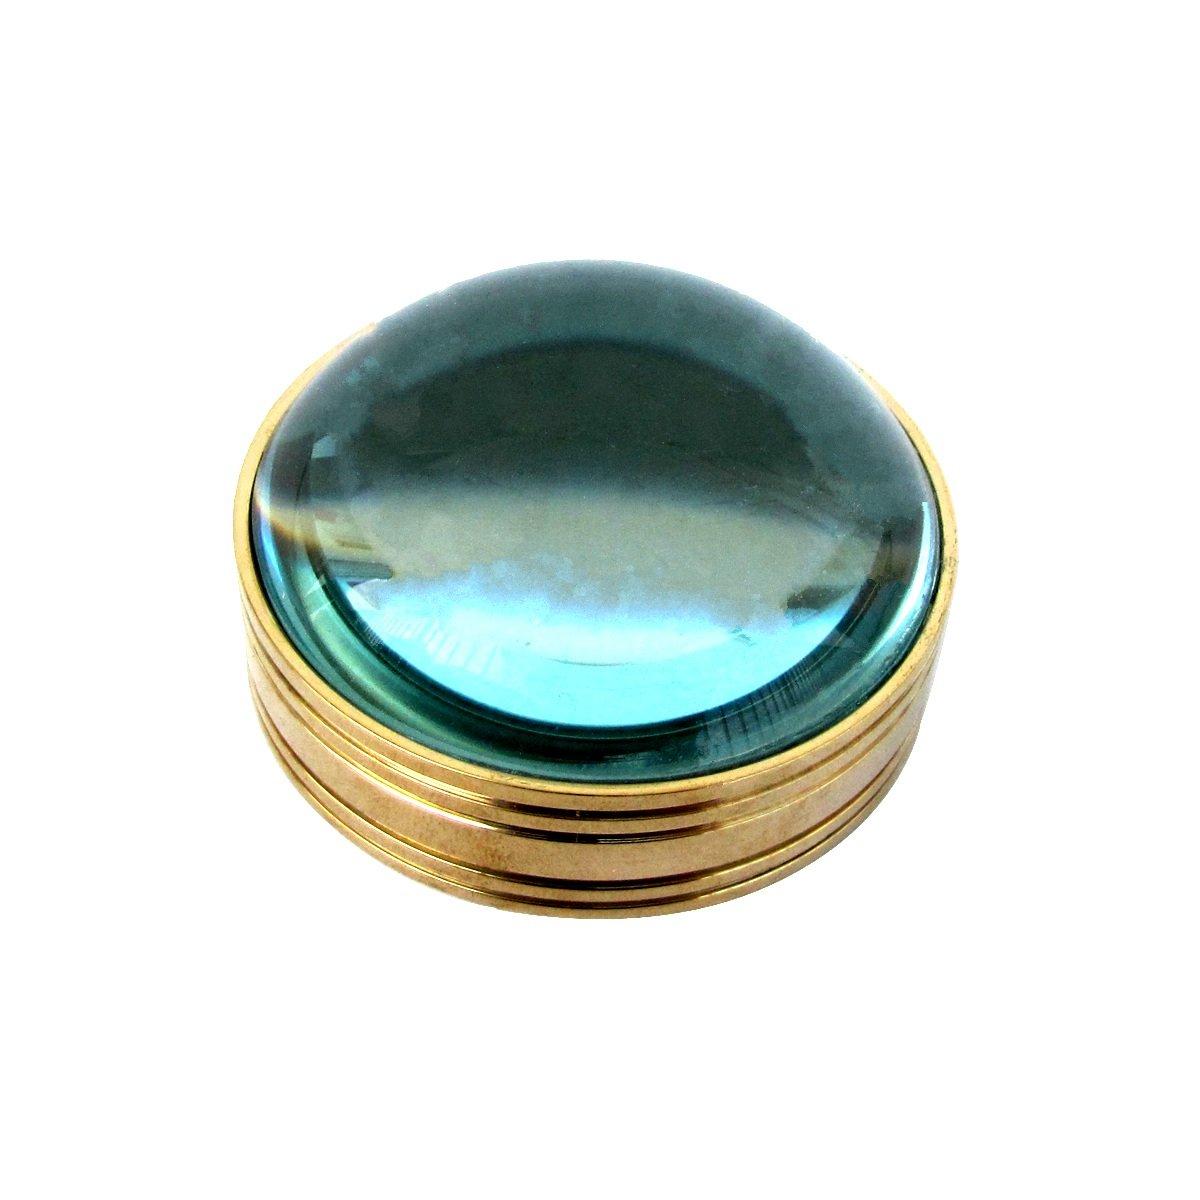 TG,LLC Solid Brass Magnifying Glass Desktop Magnifier